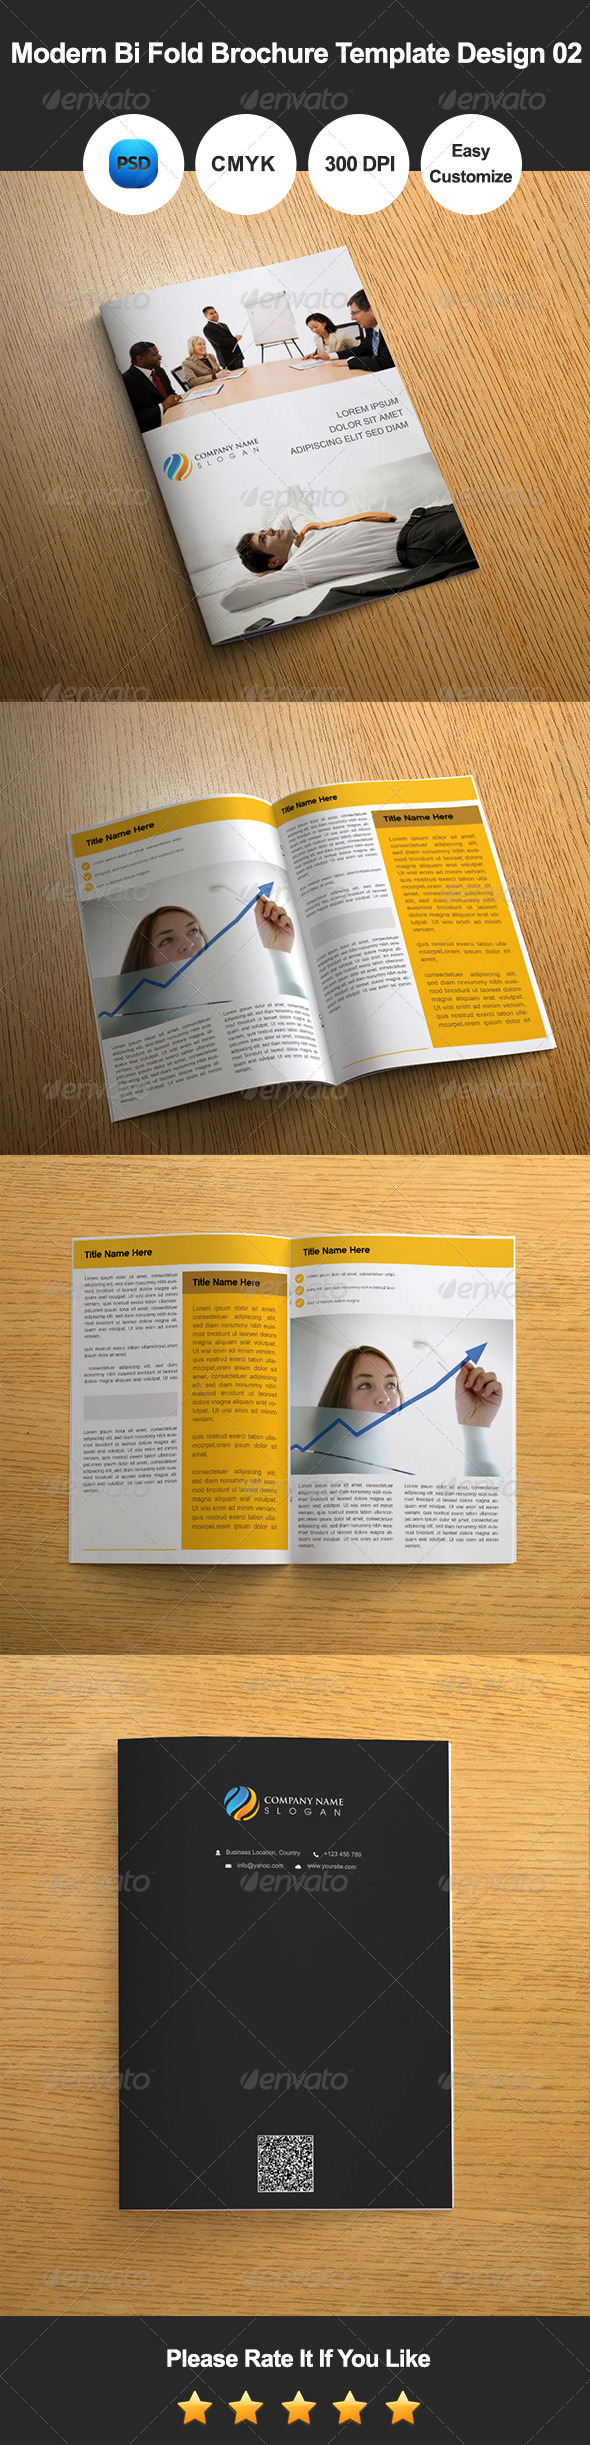 Bi fold Brochure Template Design at Cheap rate!!! Preview